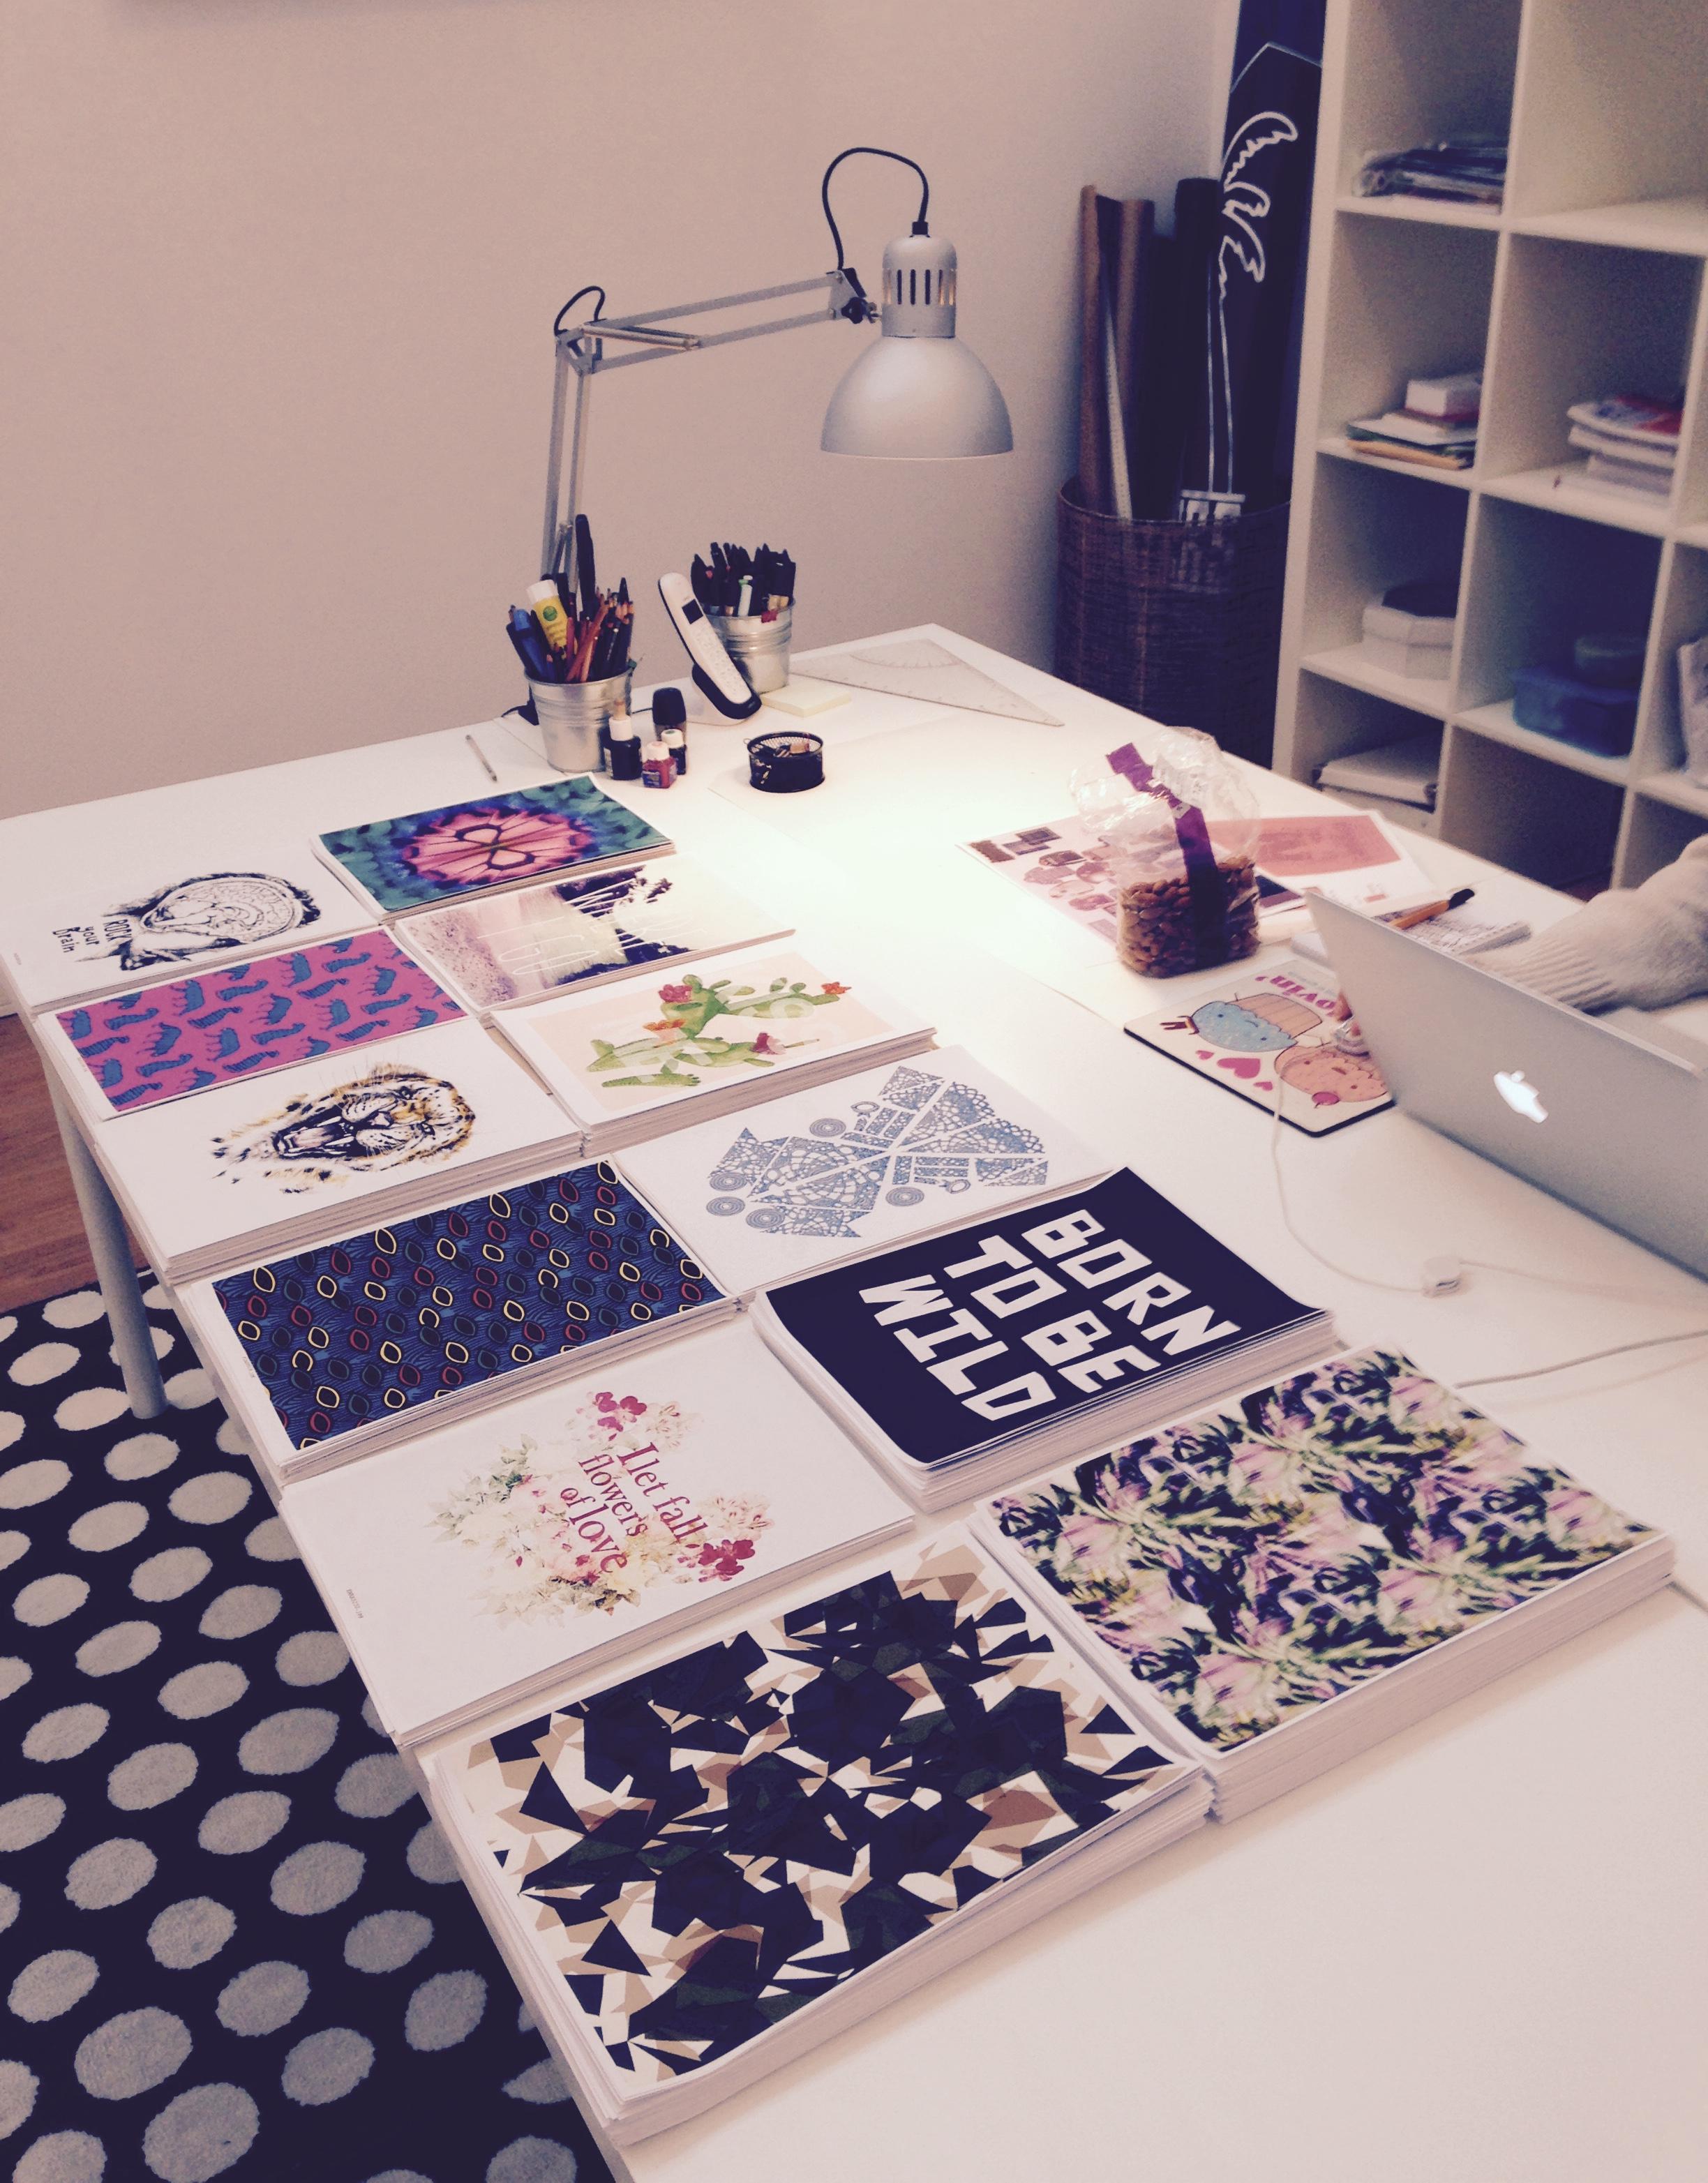 Recherchons Graphistes Textiles Freelance